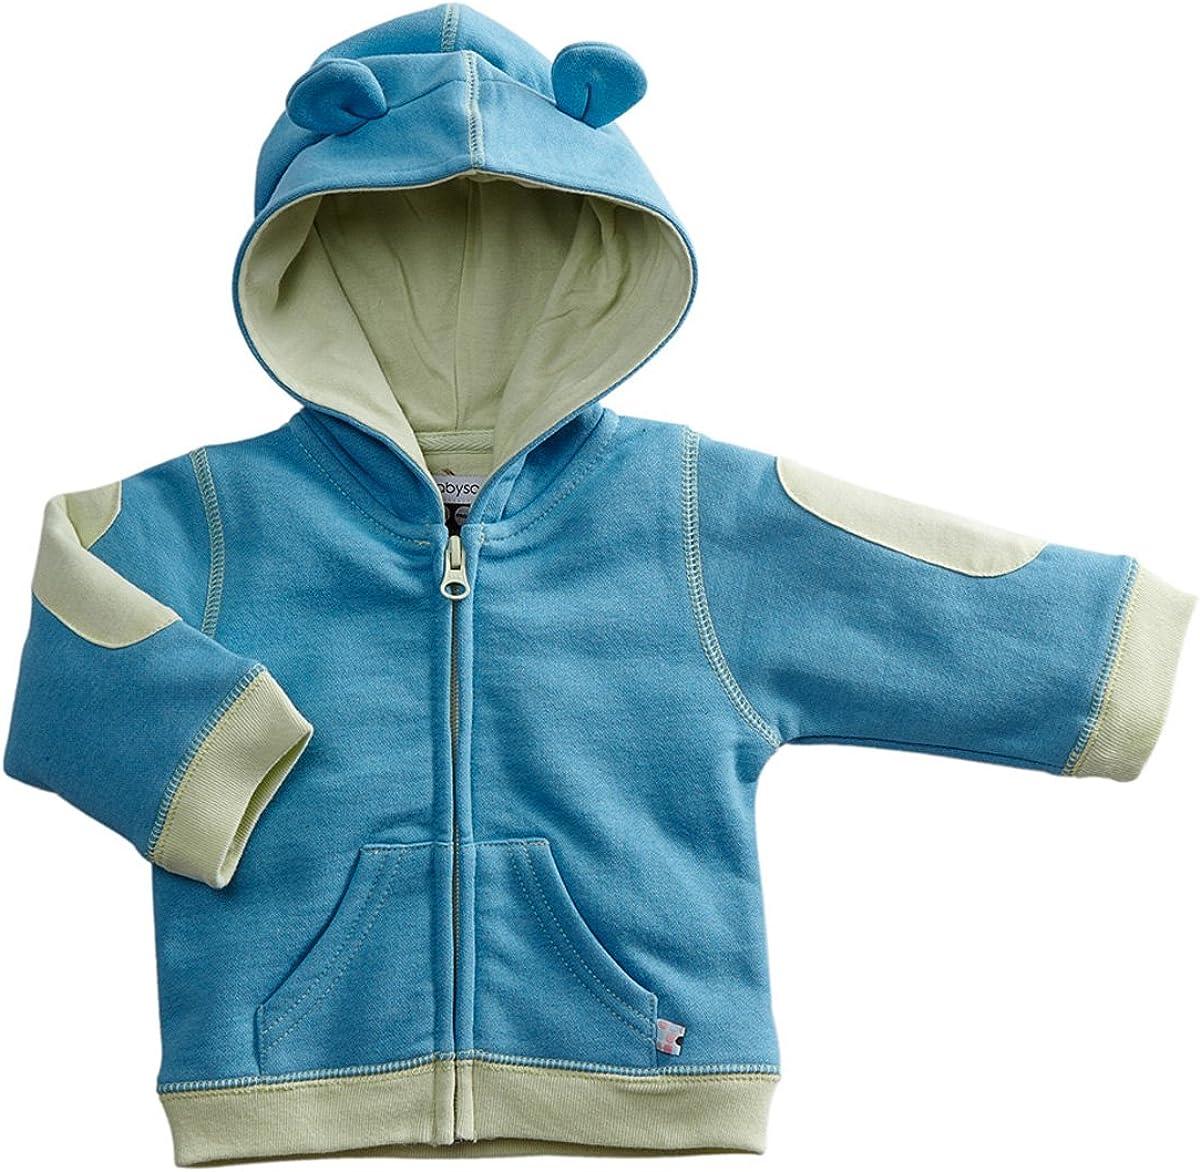 Babysoy Bunny Ears Fleece Hoodie Jacket (6-12 Months, Ocean)